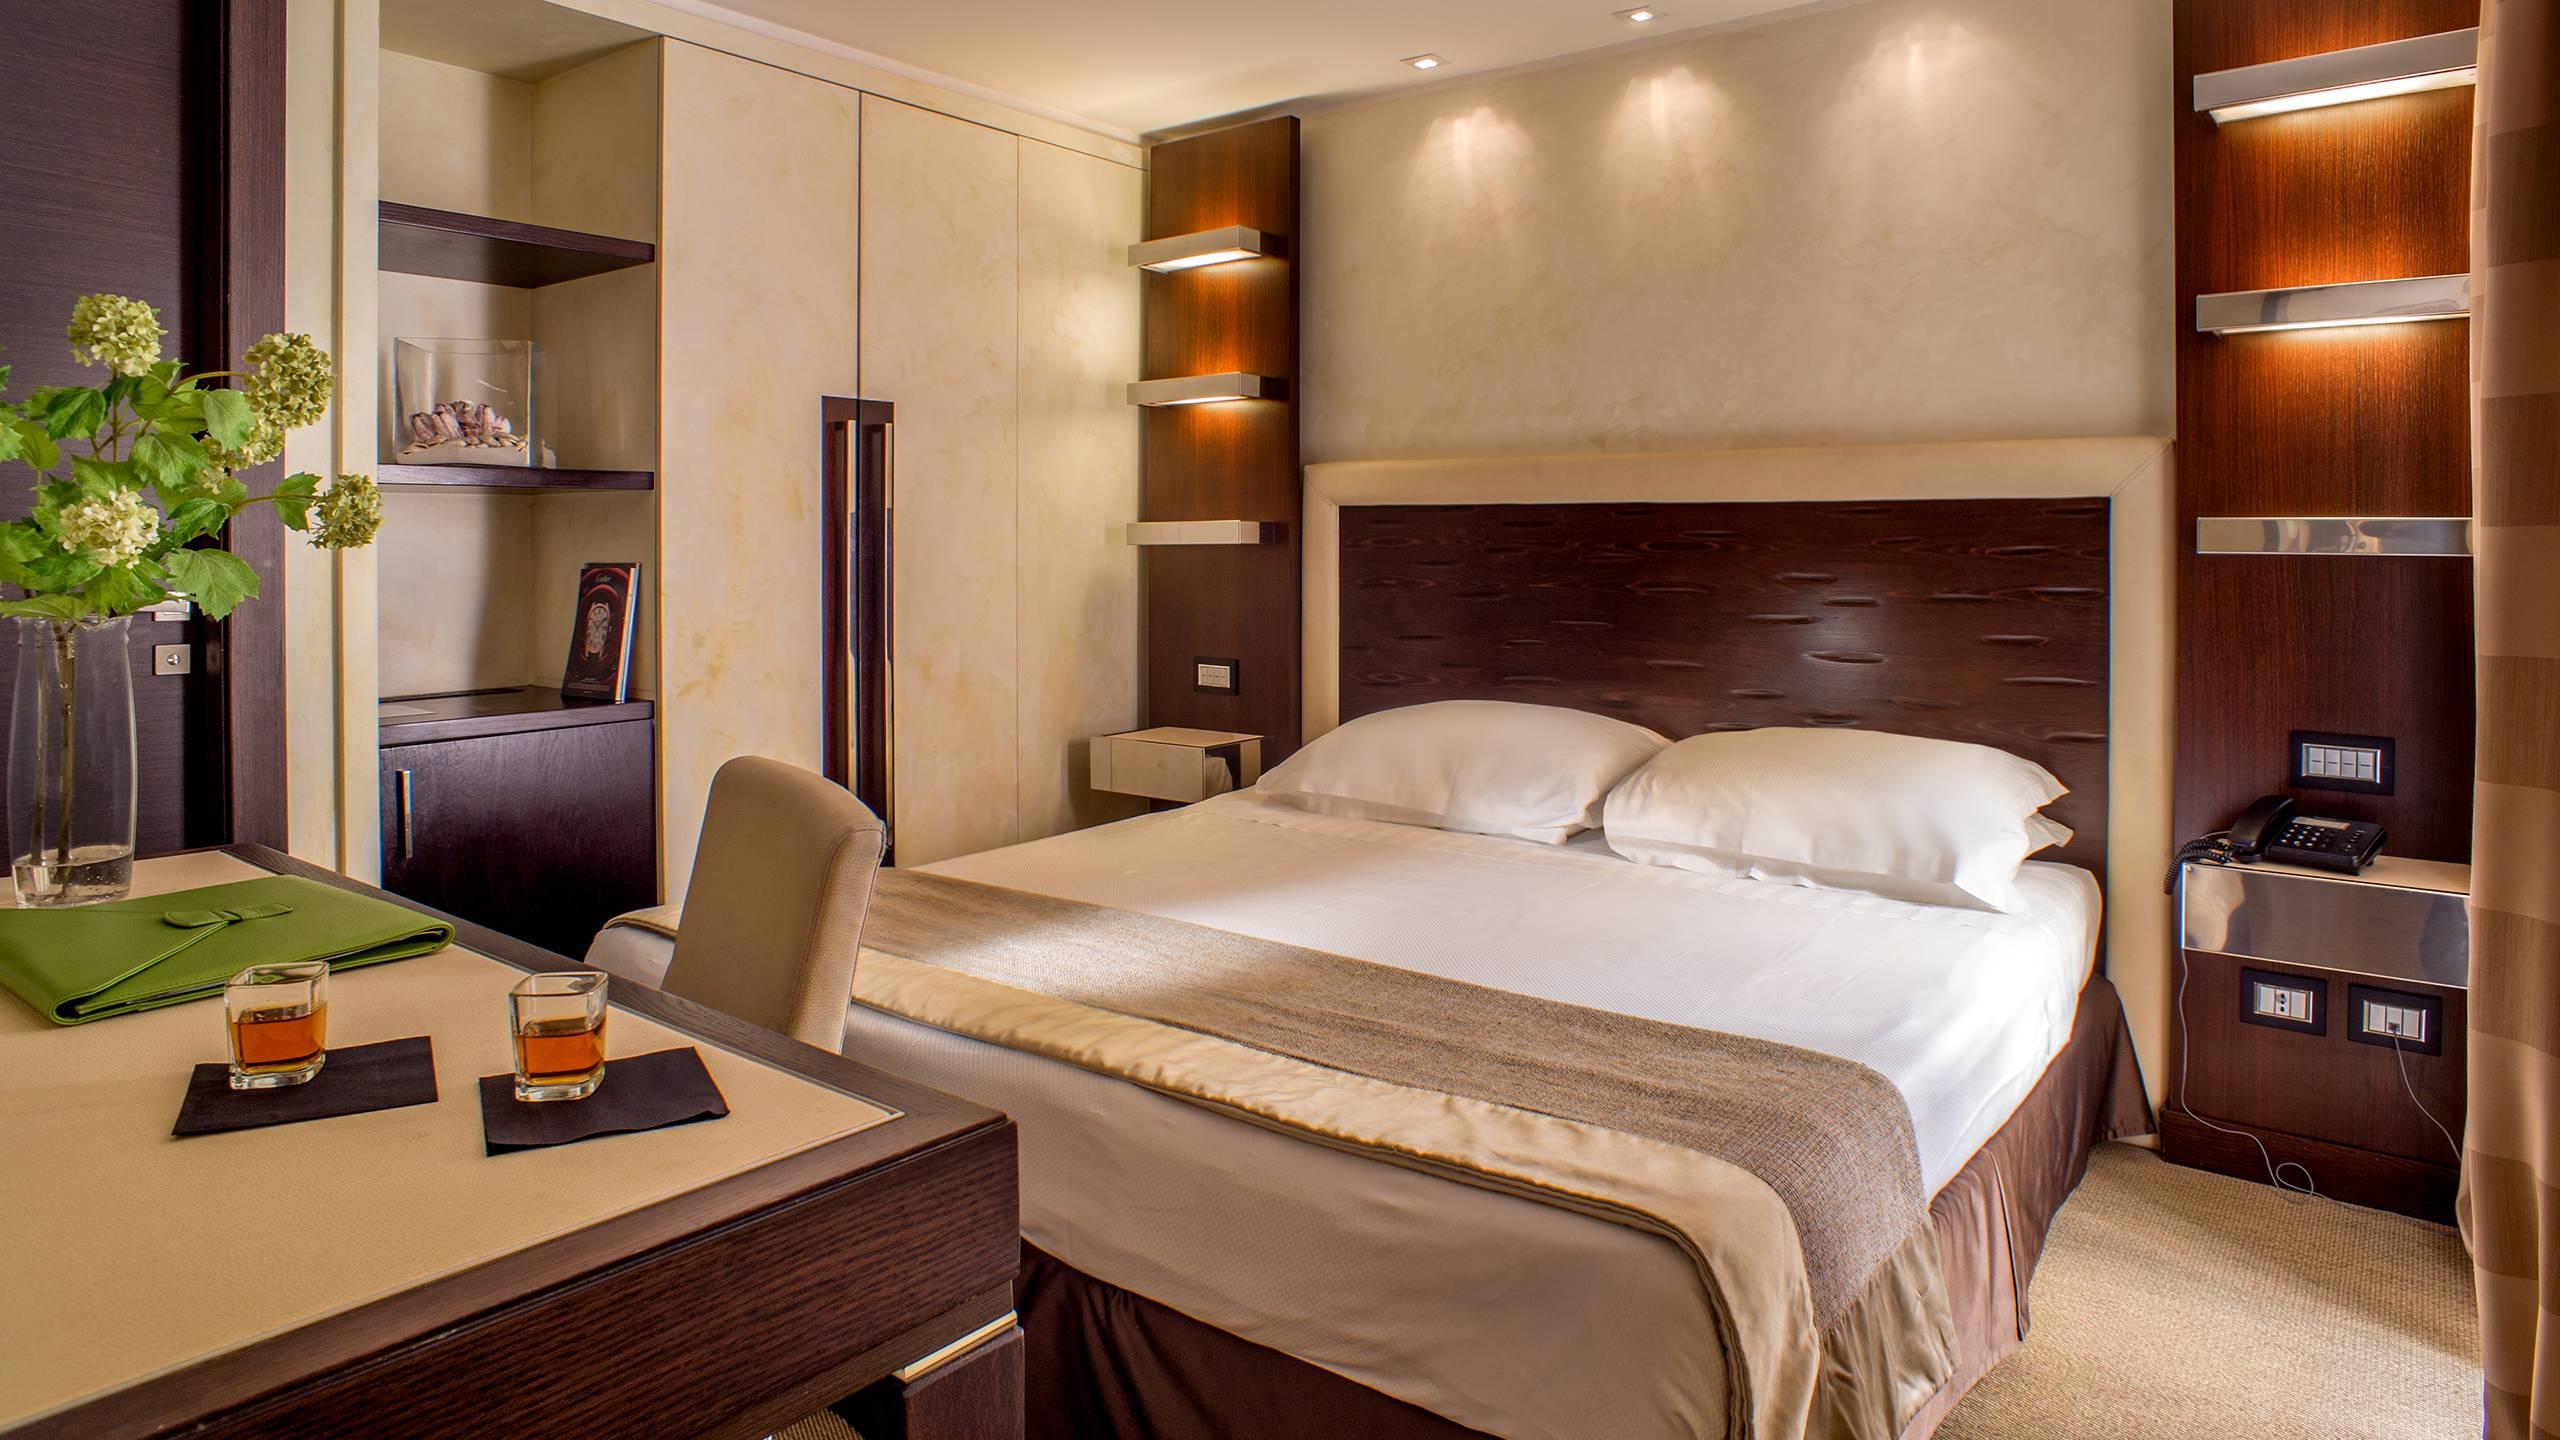 25-Les-Fleurs-Luxury-House-Rome-room